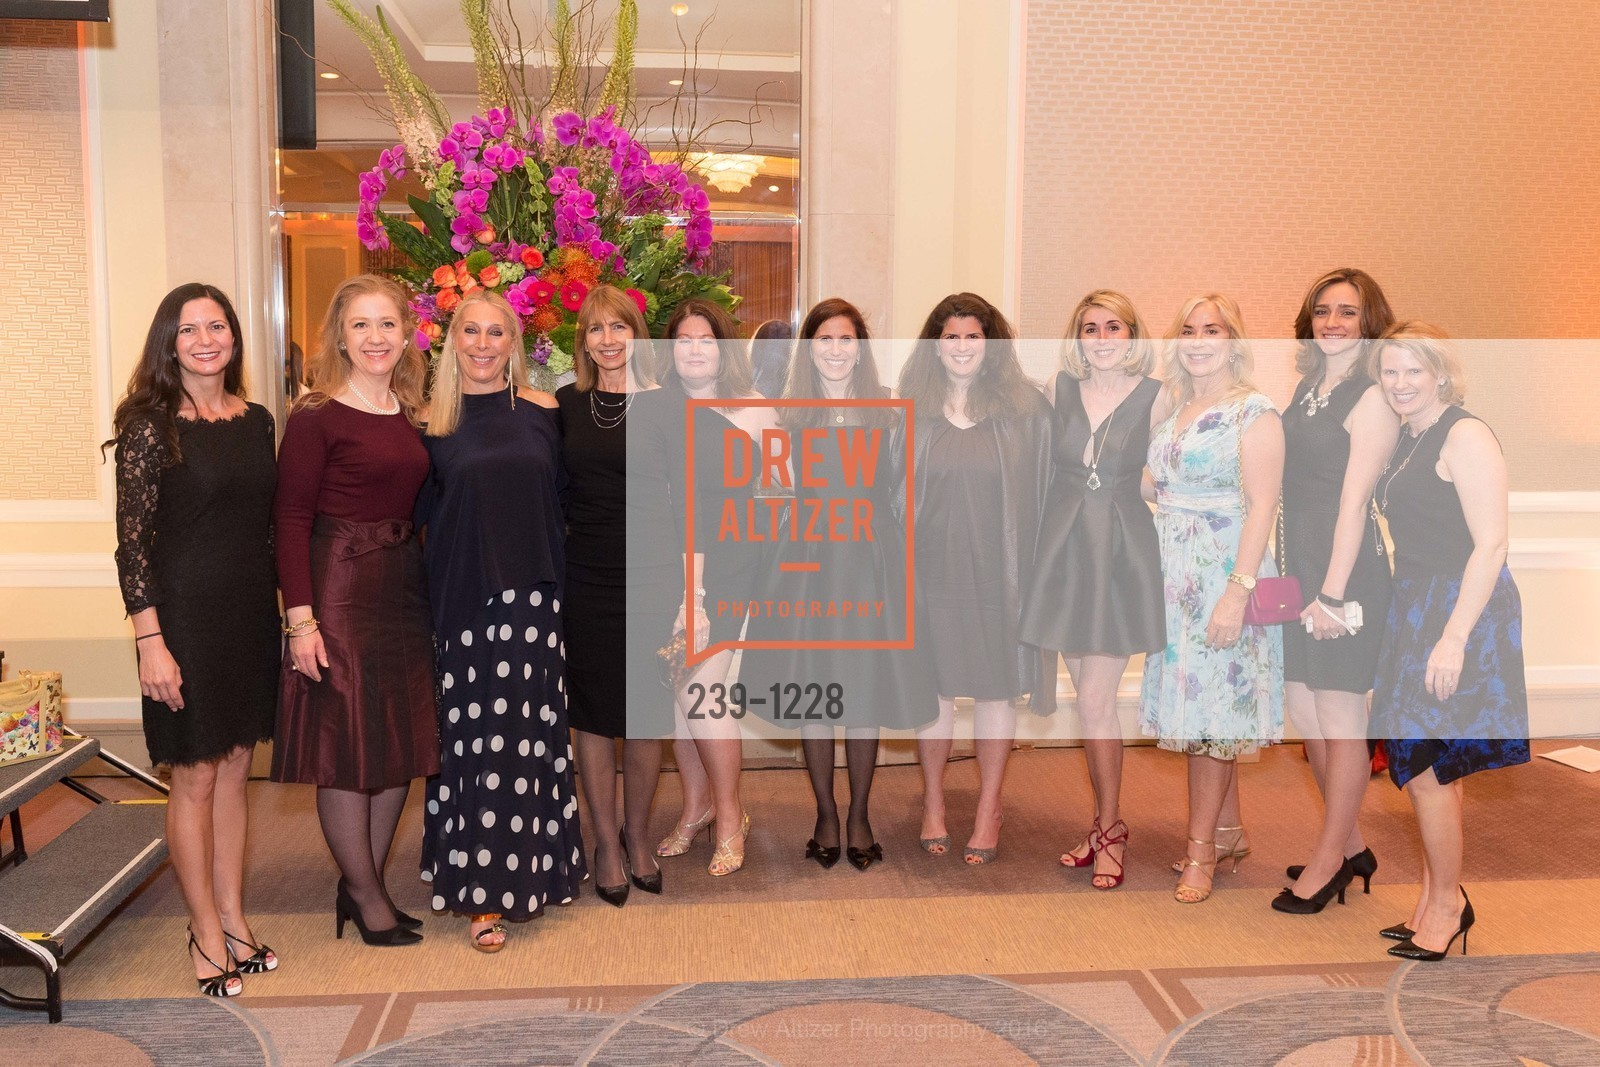 Selin Wold, Carol Benz, Betsy Linder, Carol Louie, Michelle Gilman-Jasen, Amy Wender-Hoch, Pam Zaragoza, Marie Hurabiell, Photo #239-1228